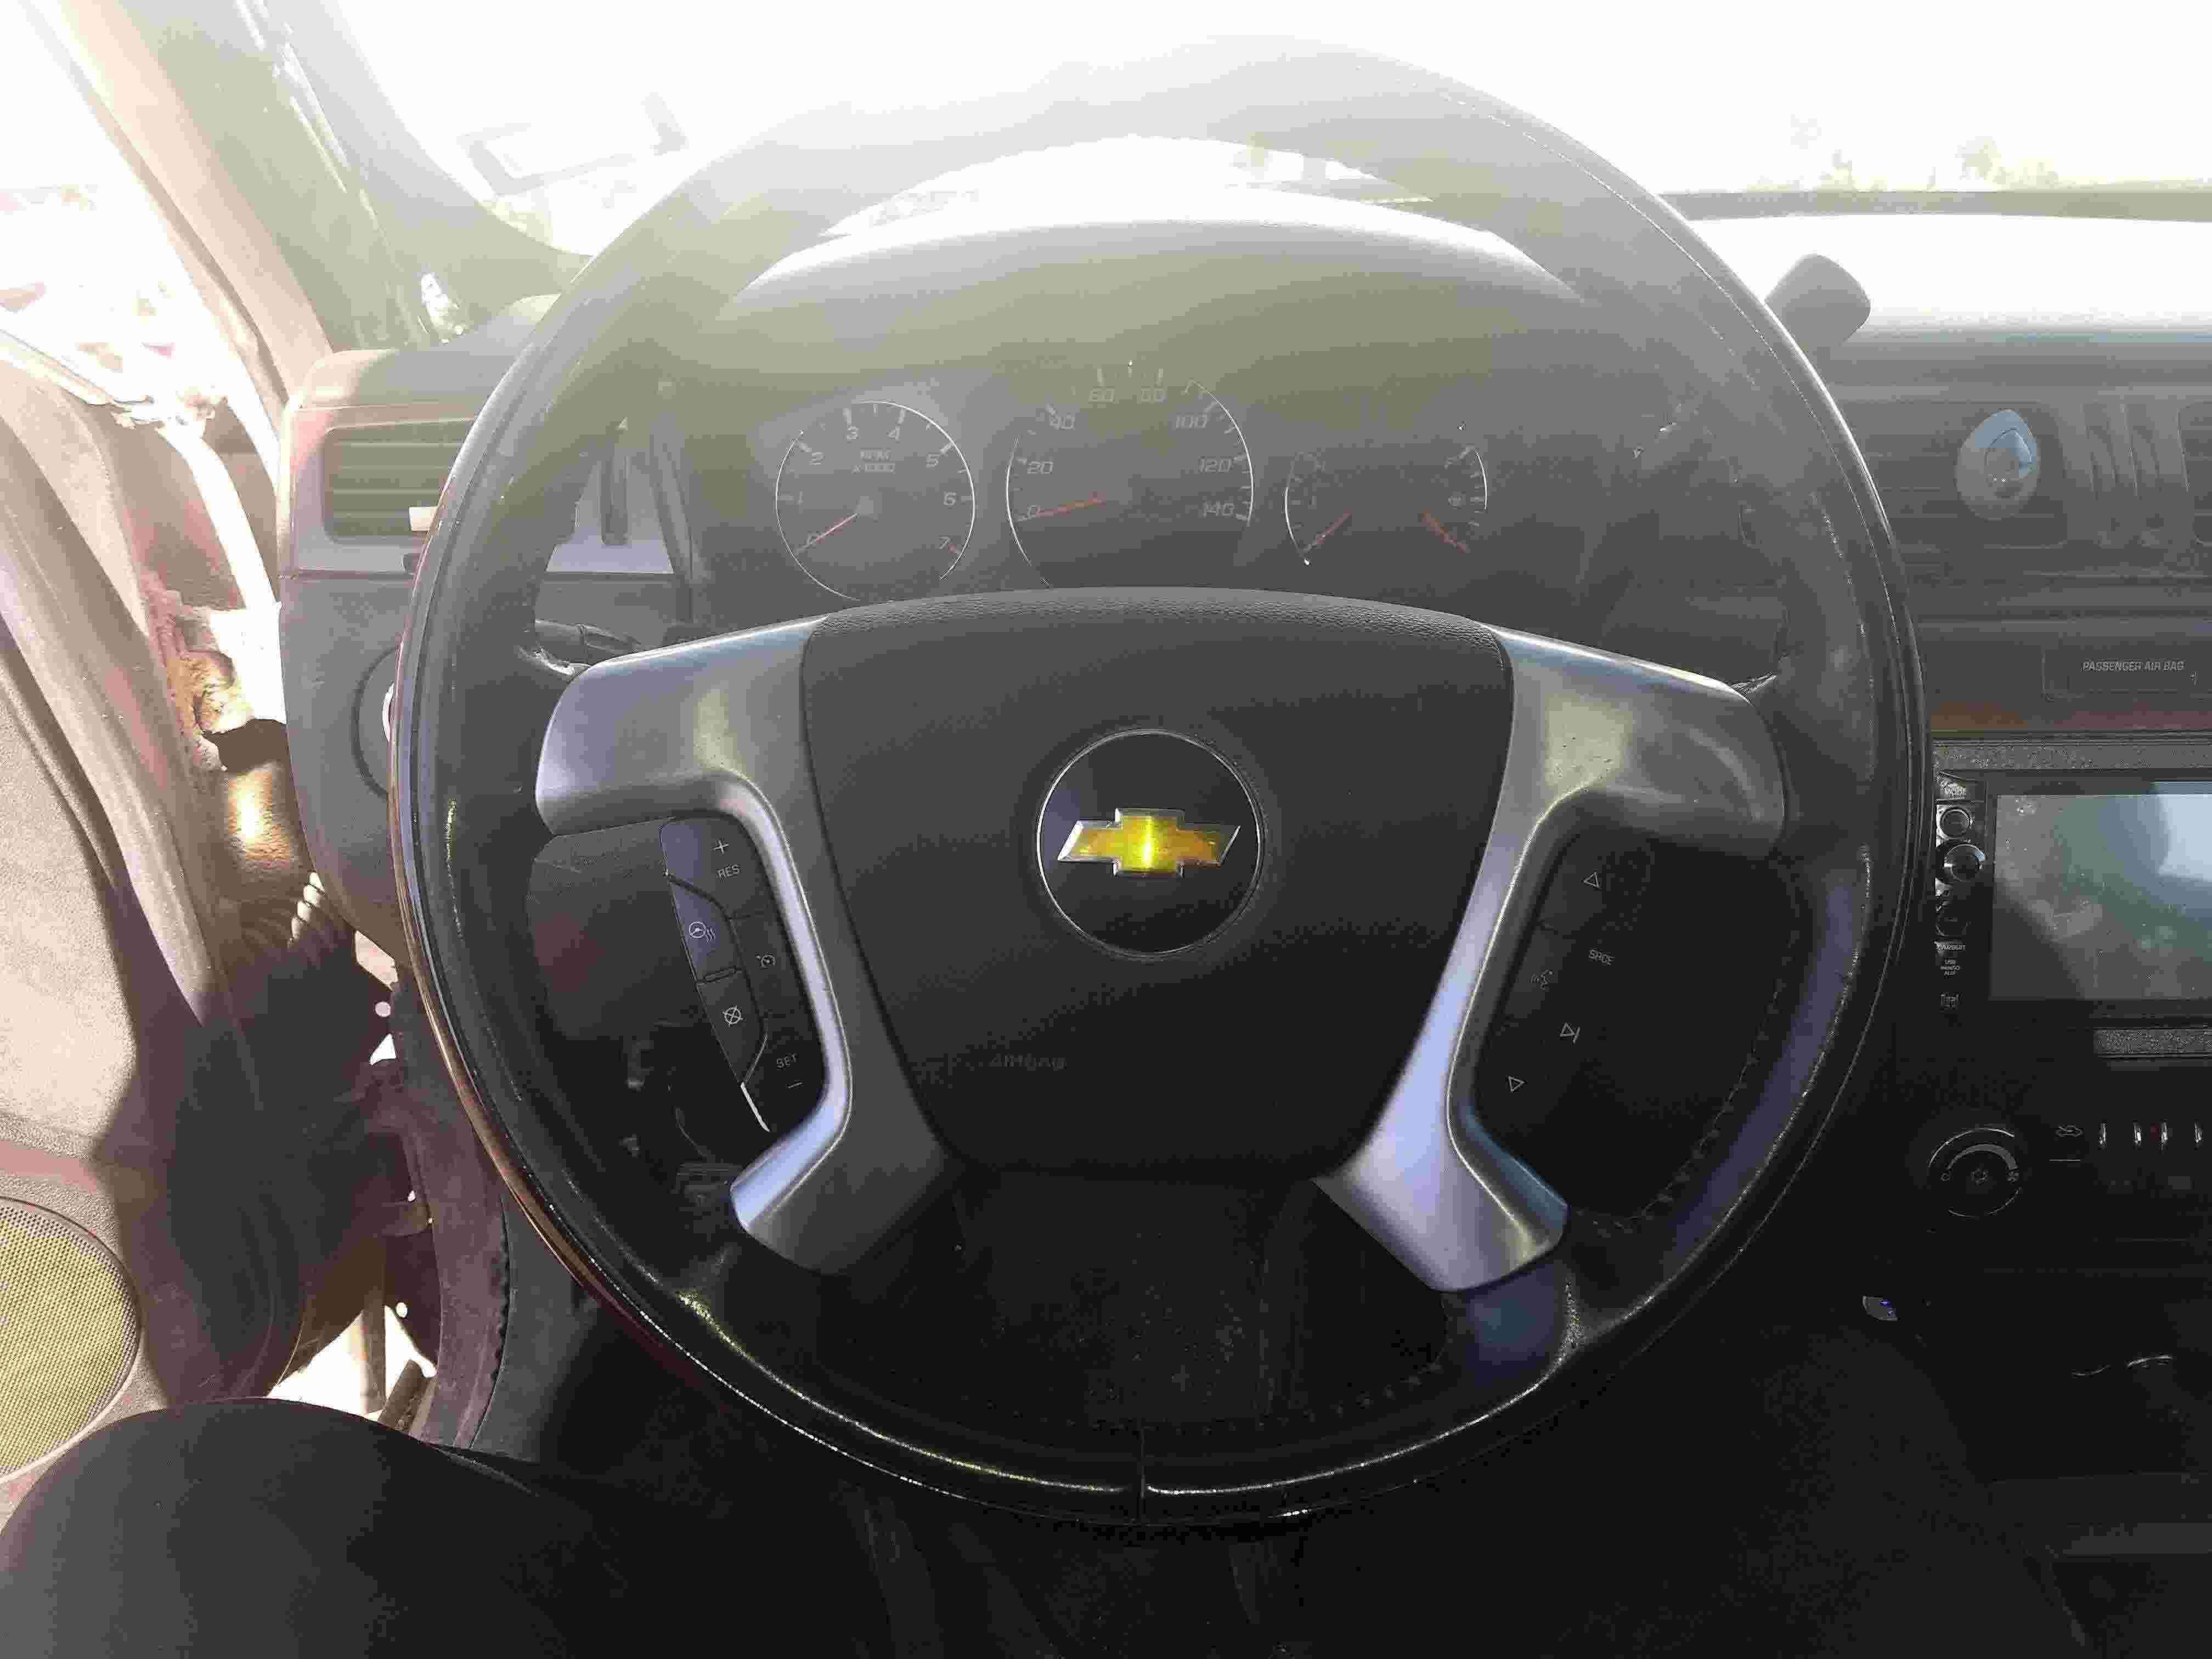 Escalade steering wheel-img_20191010_181209777_1570749662401.jpg